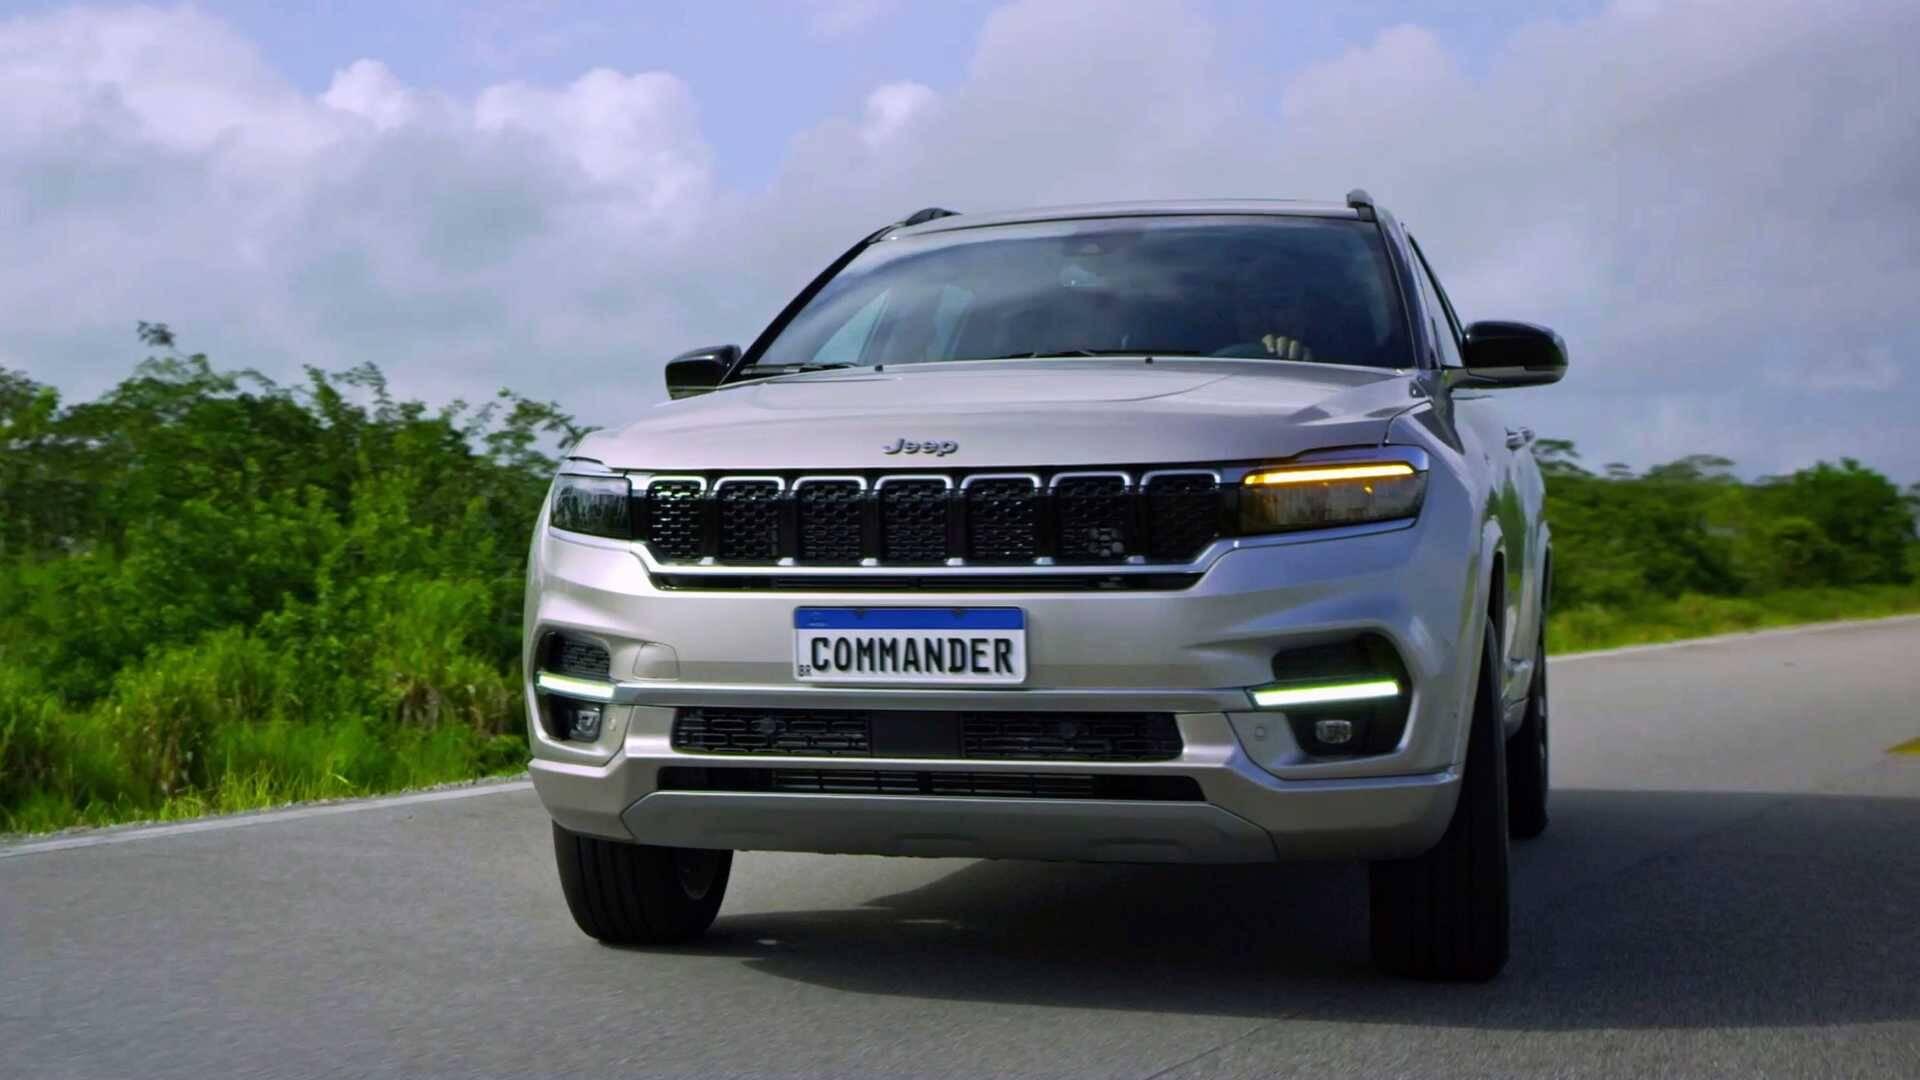 Jeep Commander. Foto: Divulgação